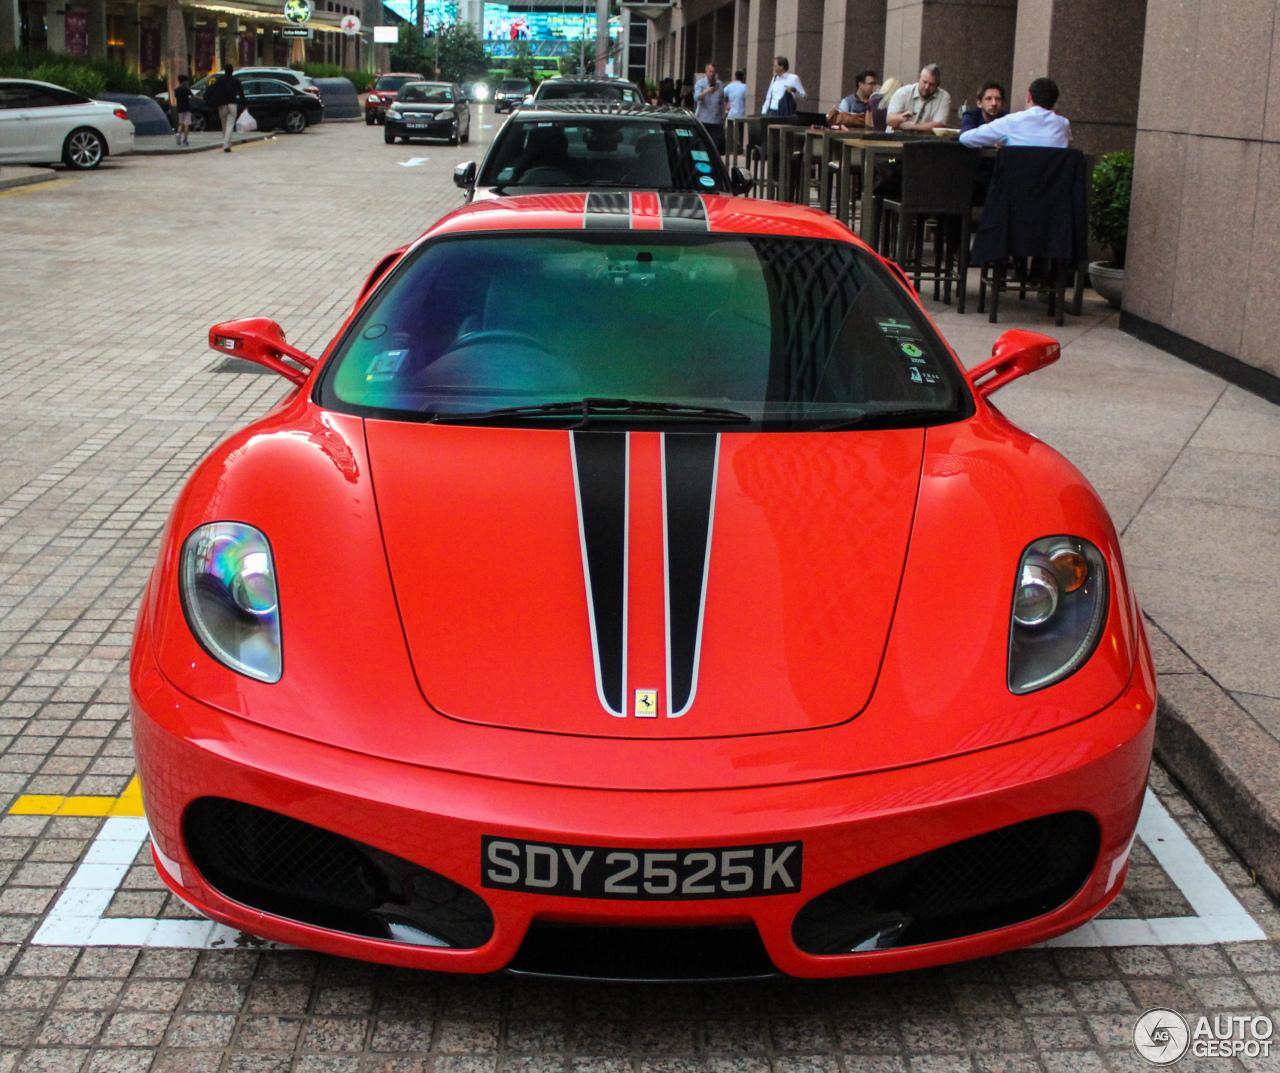 Ferrari F430 For Sale: 13 February 2017